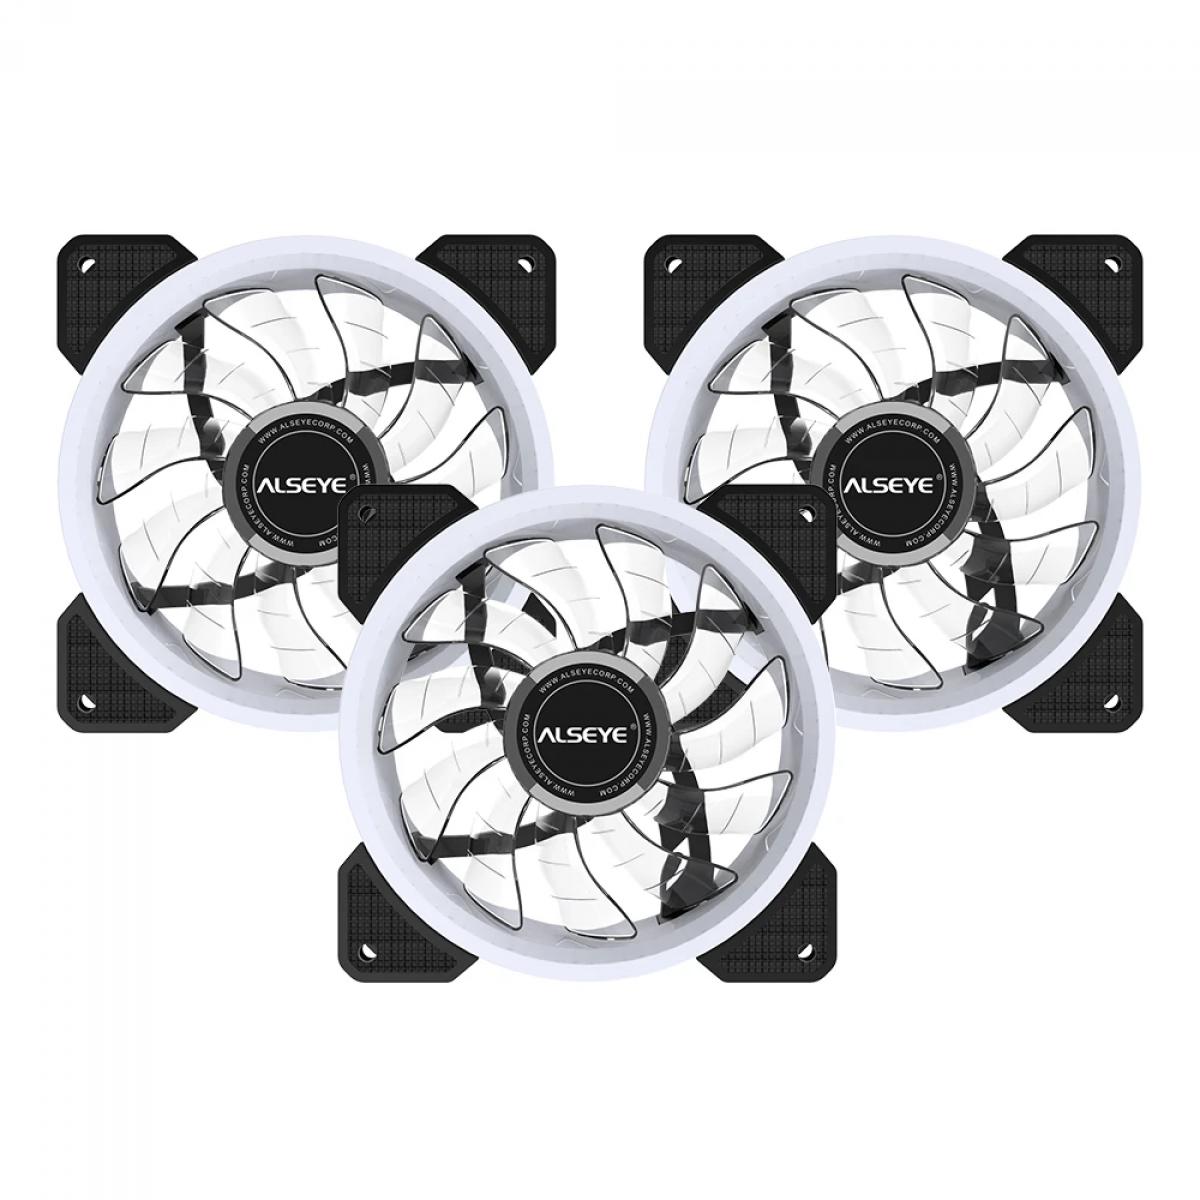 Kit Fan com 3 Unidades Alseye D-Ringer, RGB, 120mm